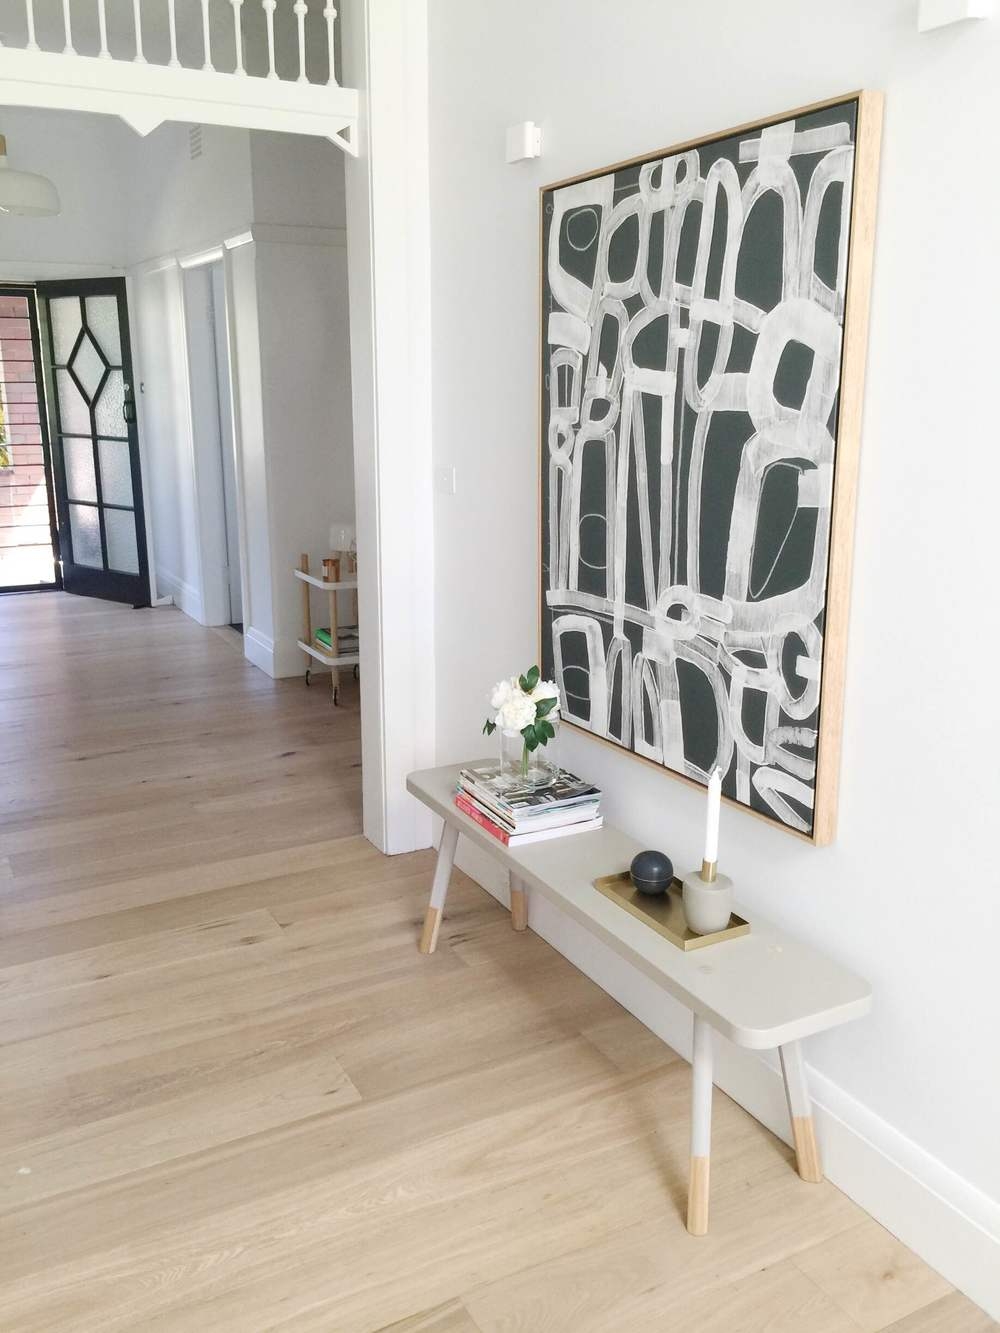 Top 10 LED lighting ideas for your home — The Little Design Corner